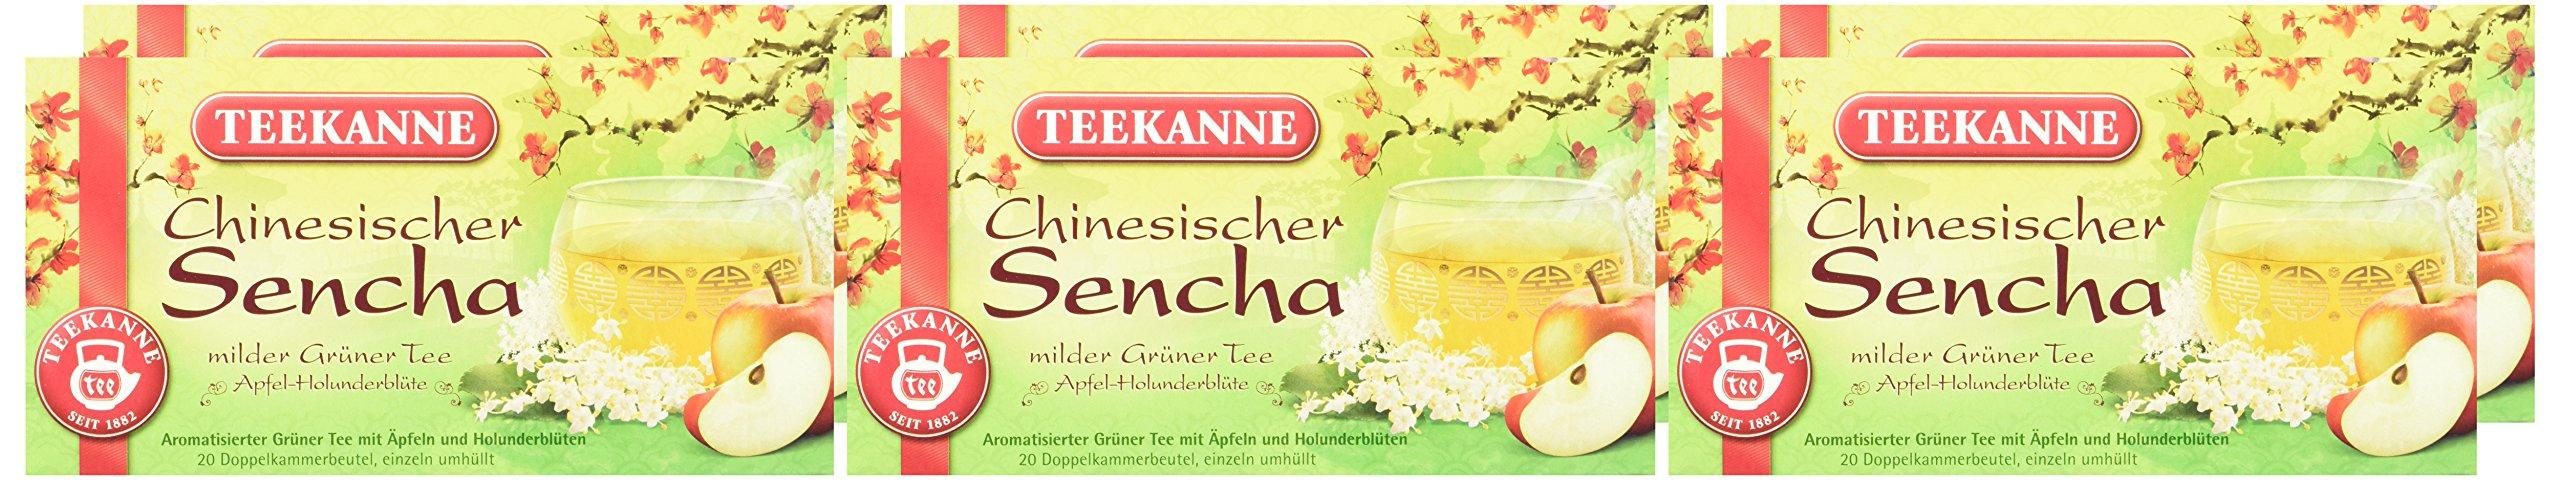 Teekanne-Lndertee-Chinesischer-Sencha-6er-Pack-6-x-35-g